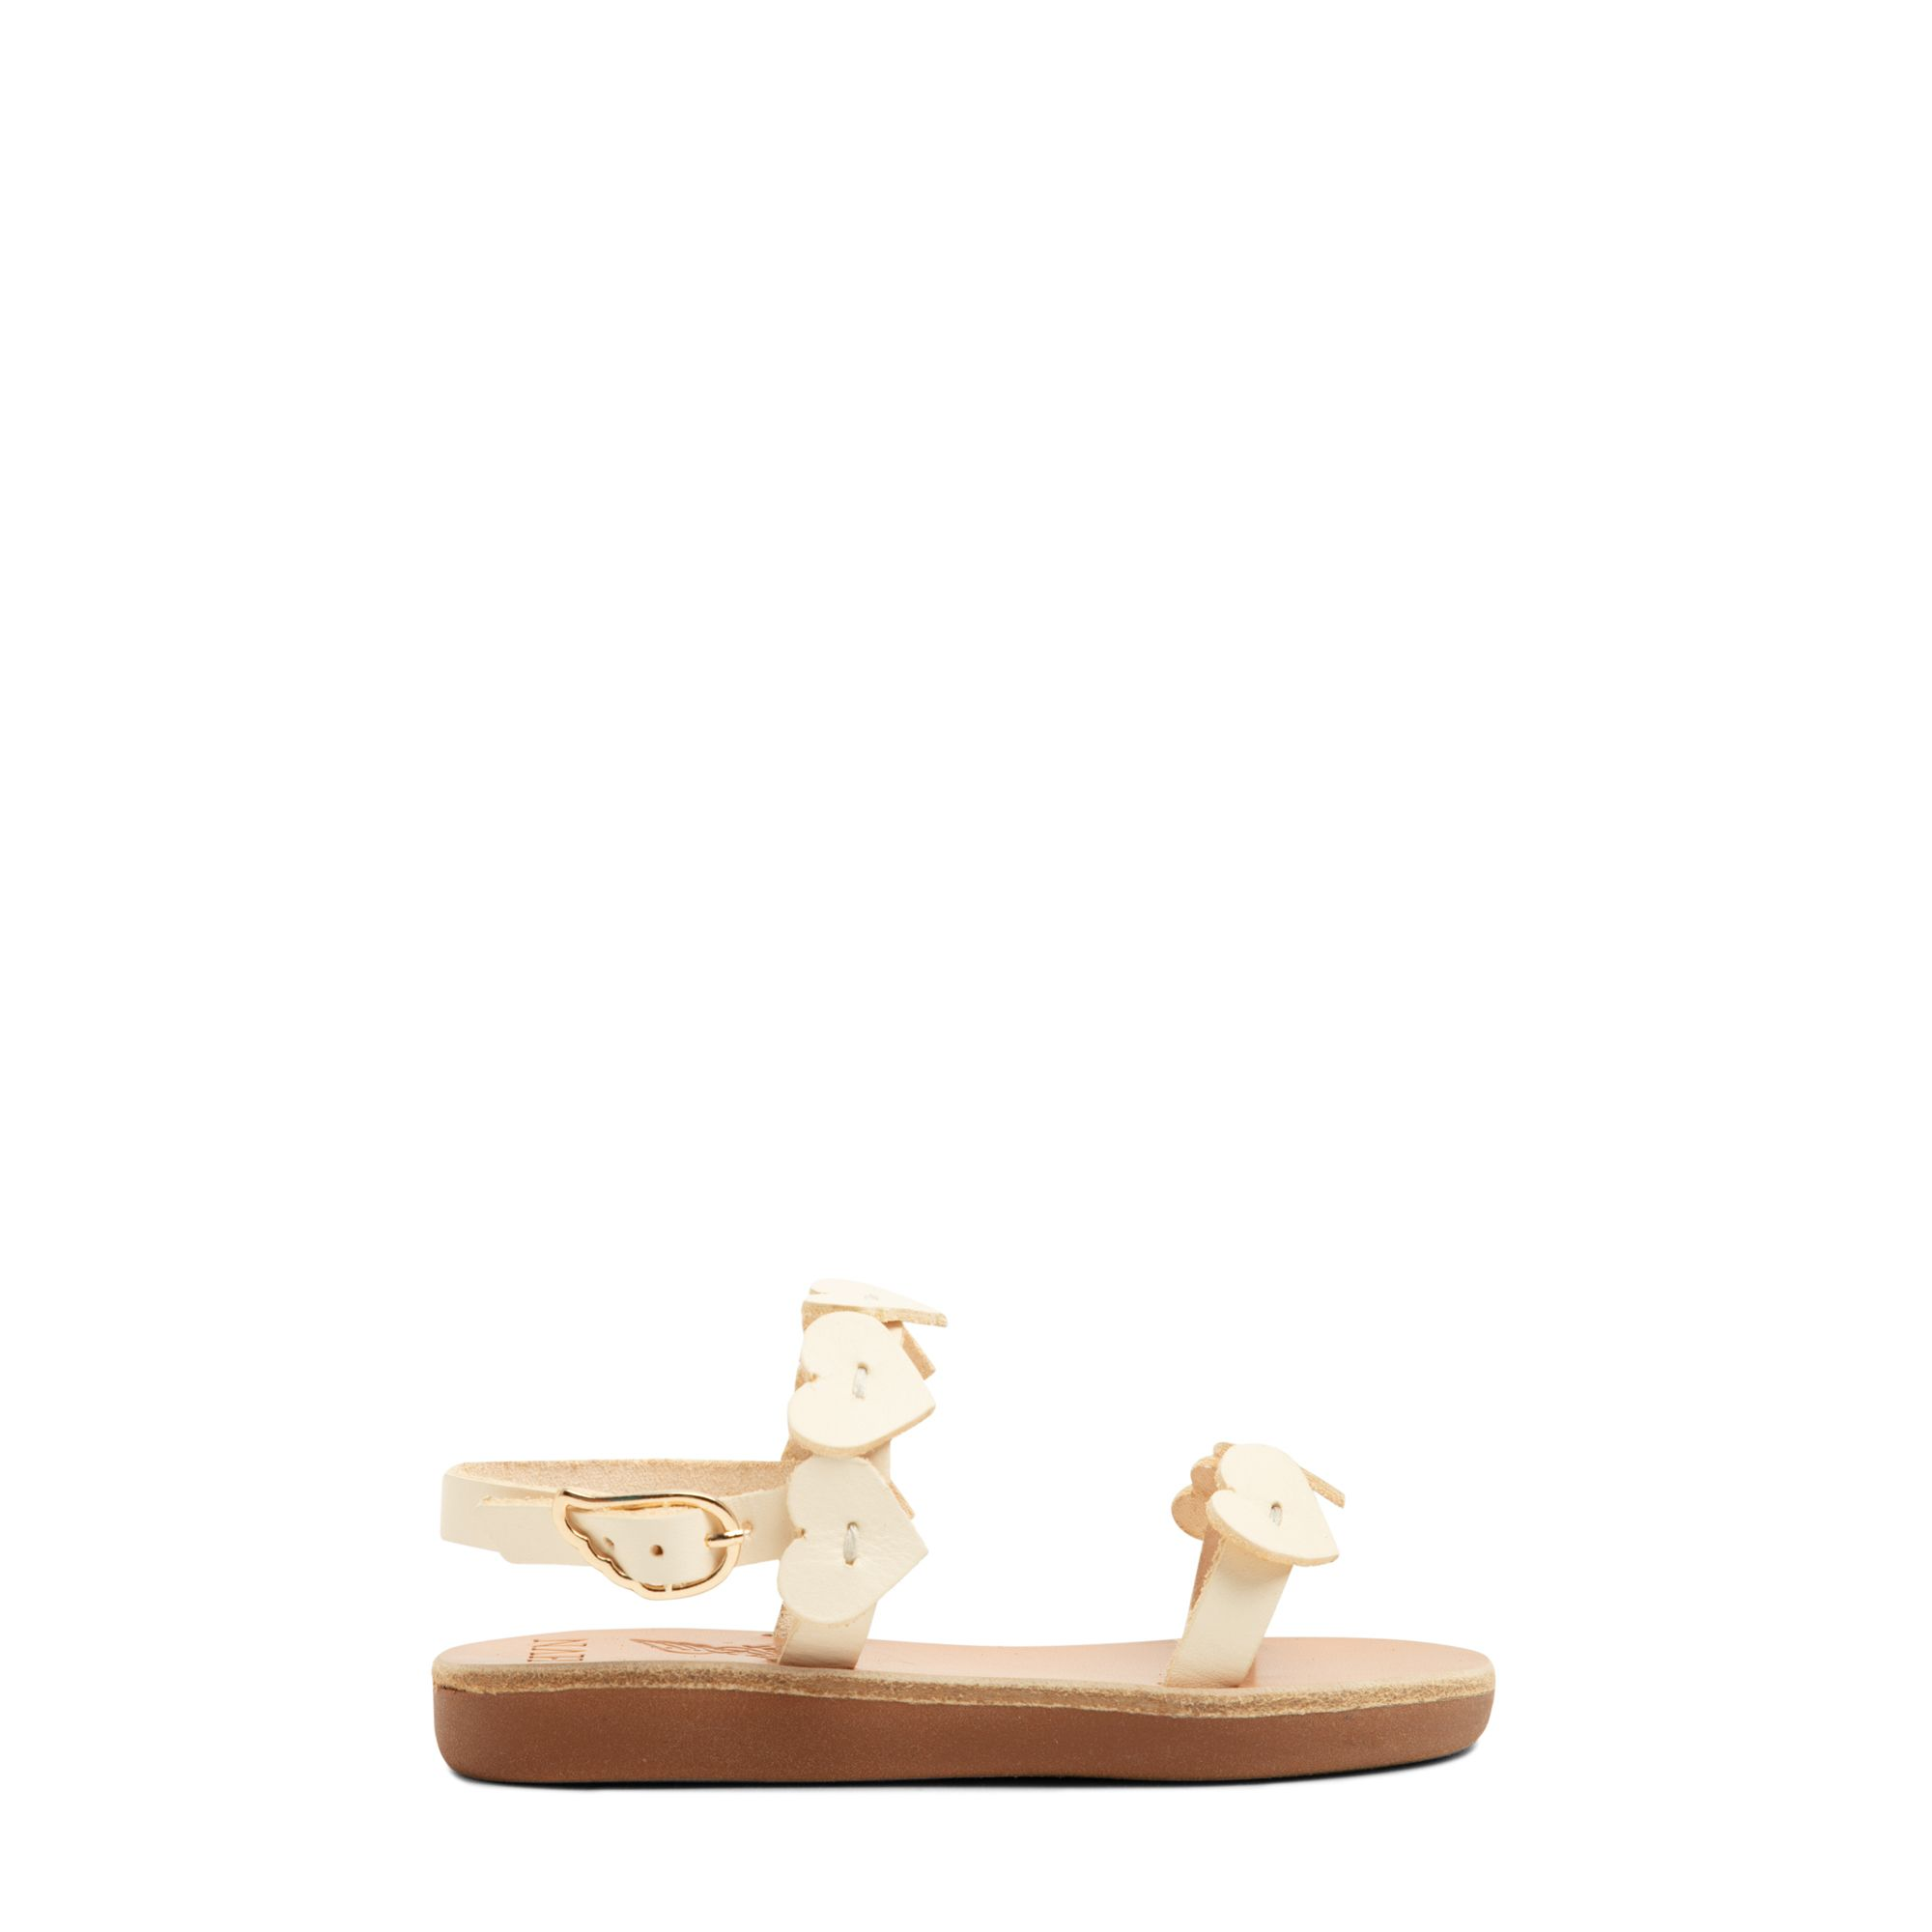 Exclusive Little Heart Clio sandals